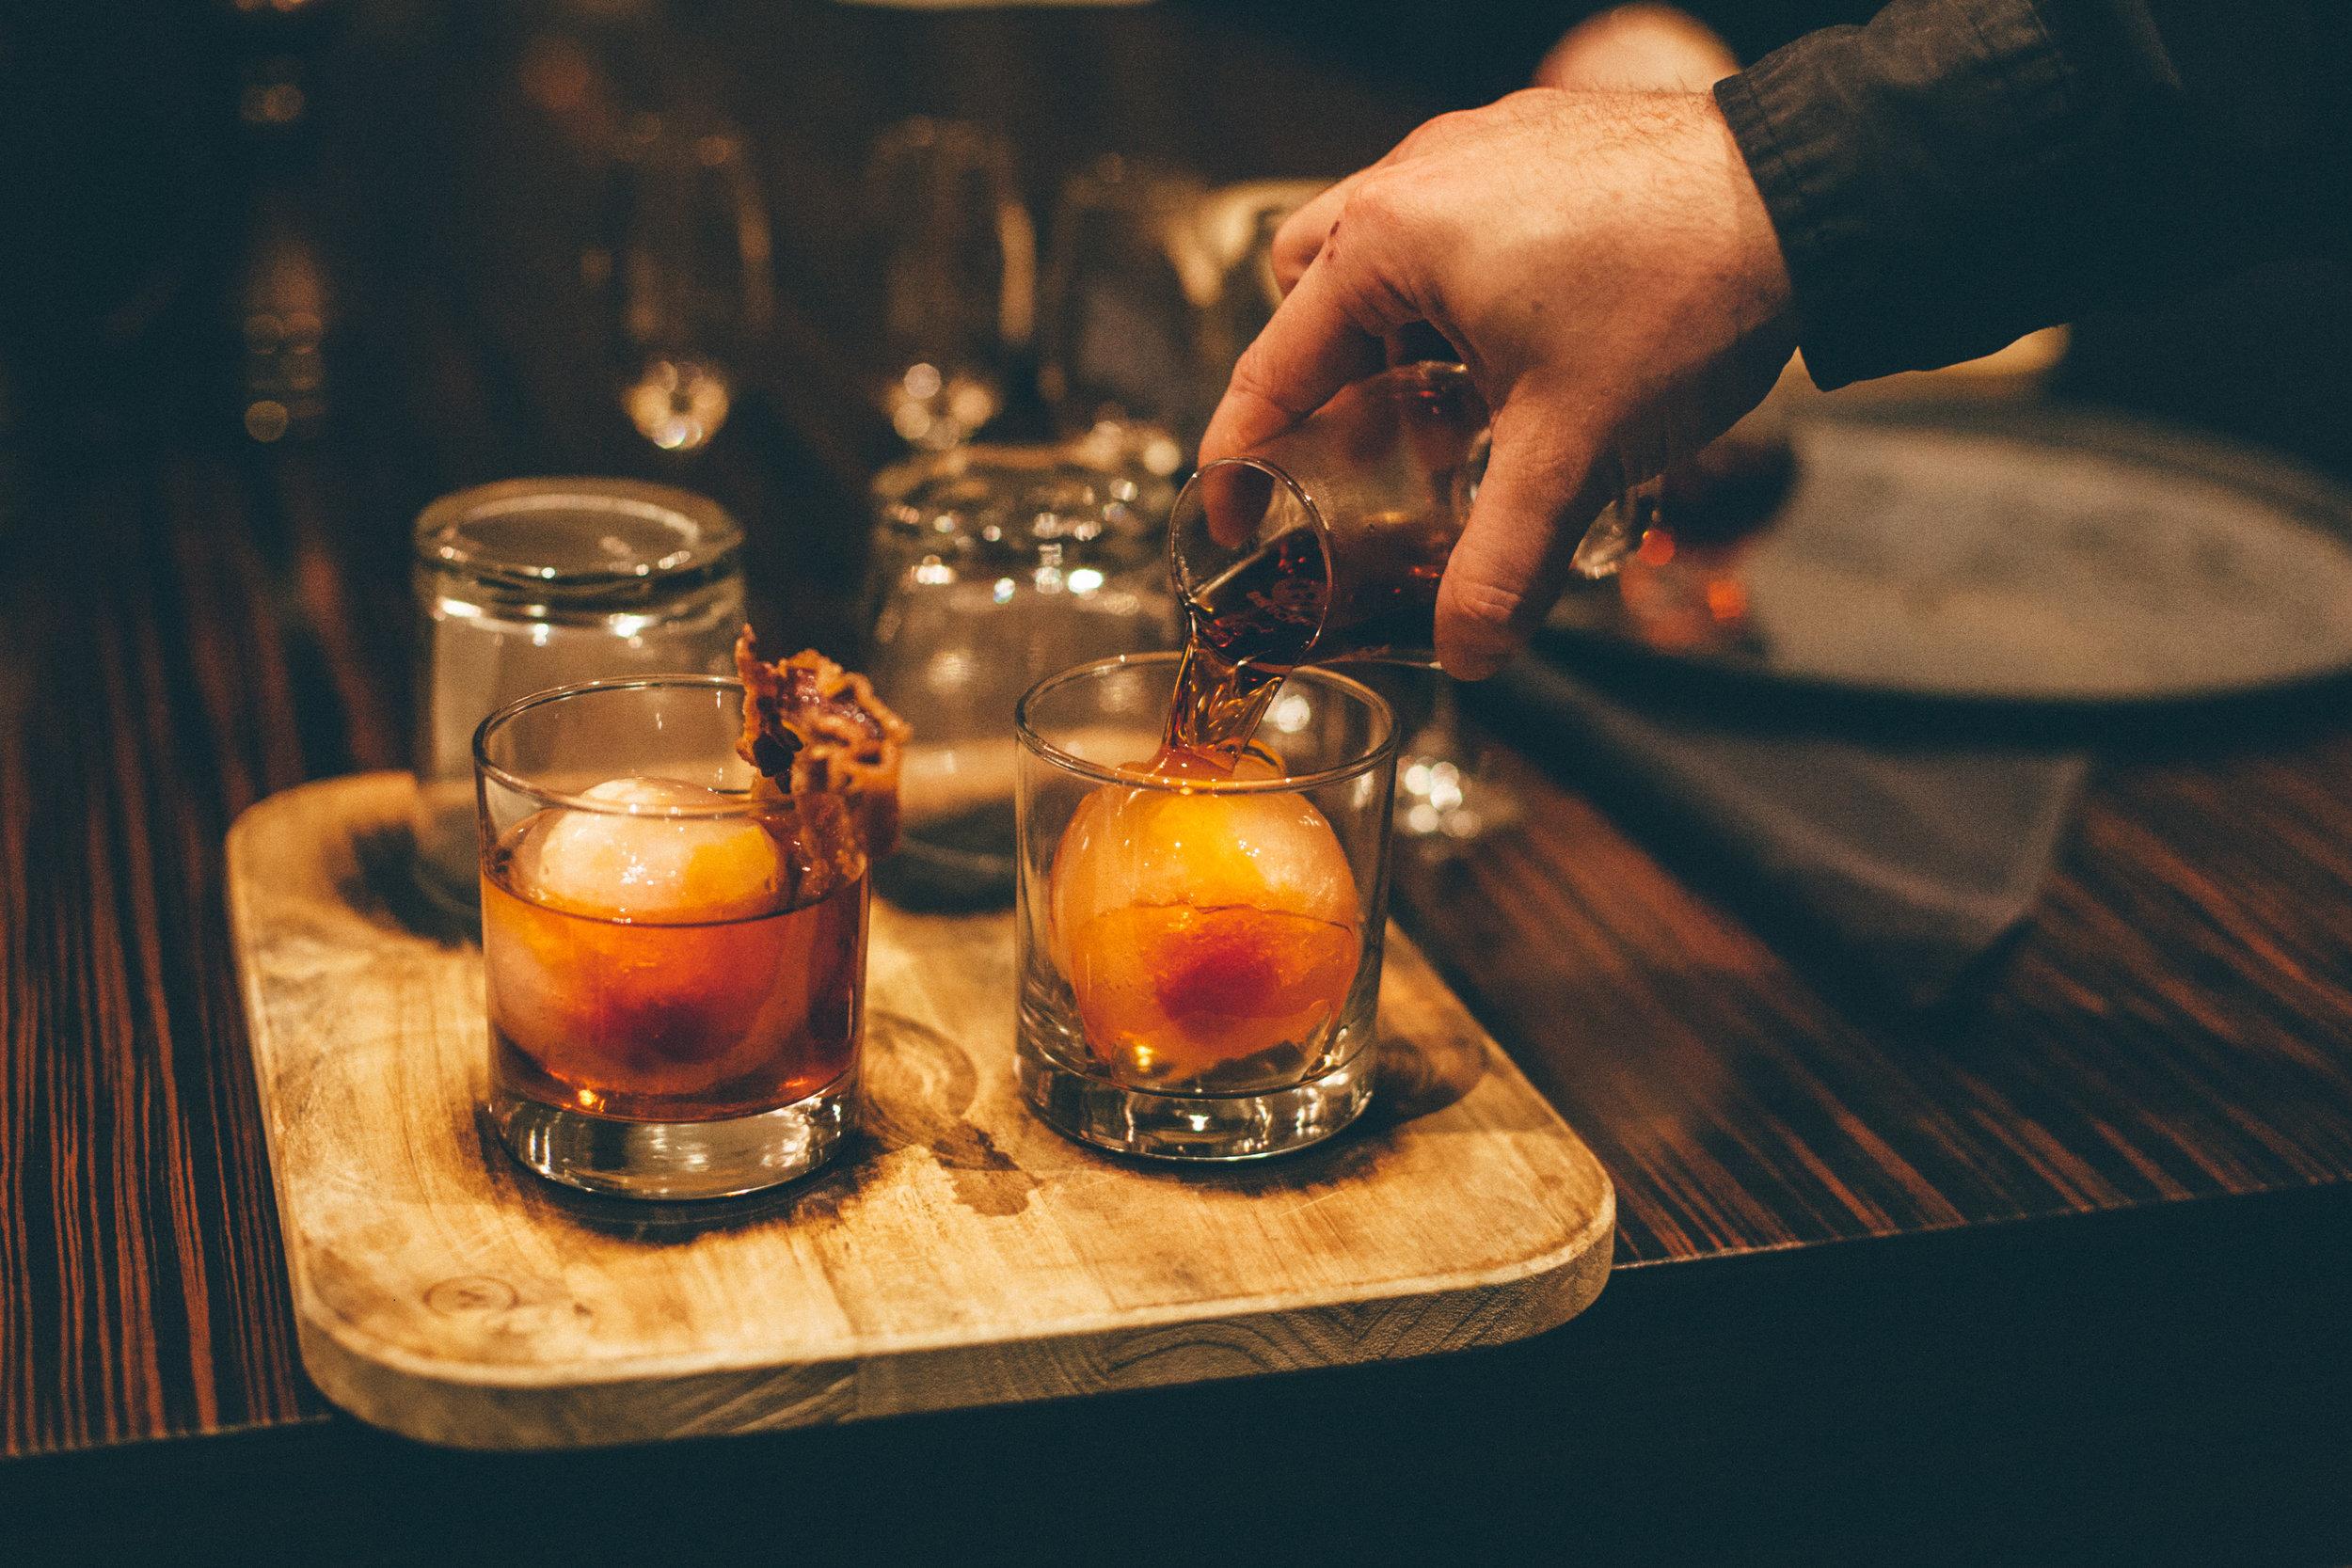 Smoked FlameStone 21: Buffalo Trace, Carpano Antica, Luxardo (bourbon barrel-aged in house, 21 days)